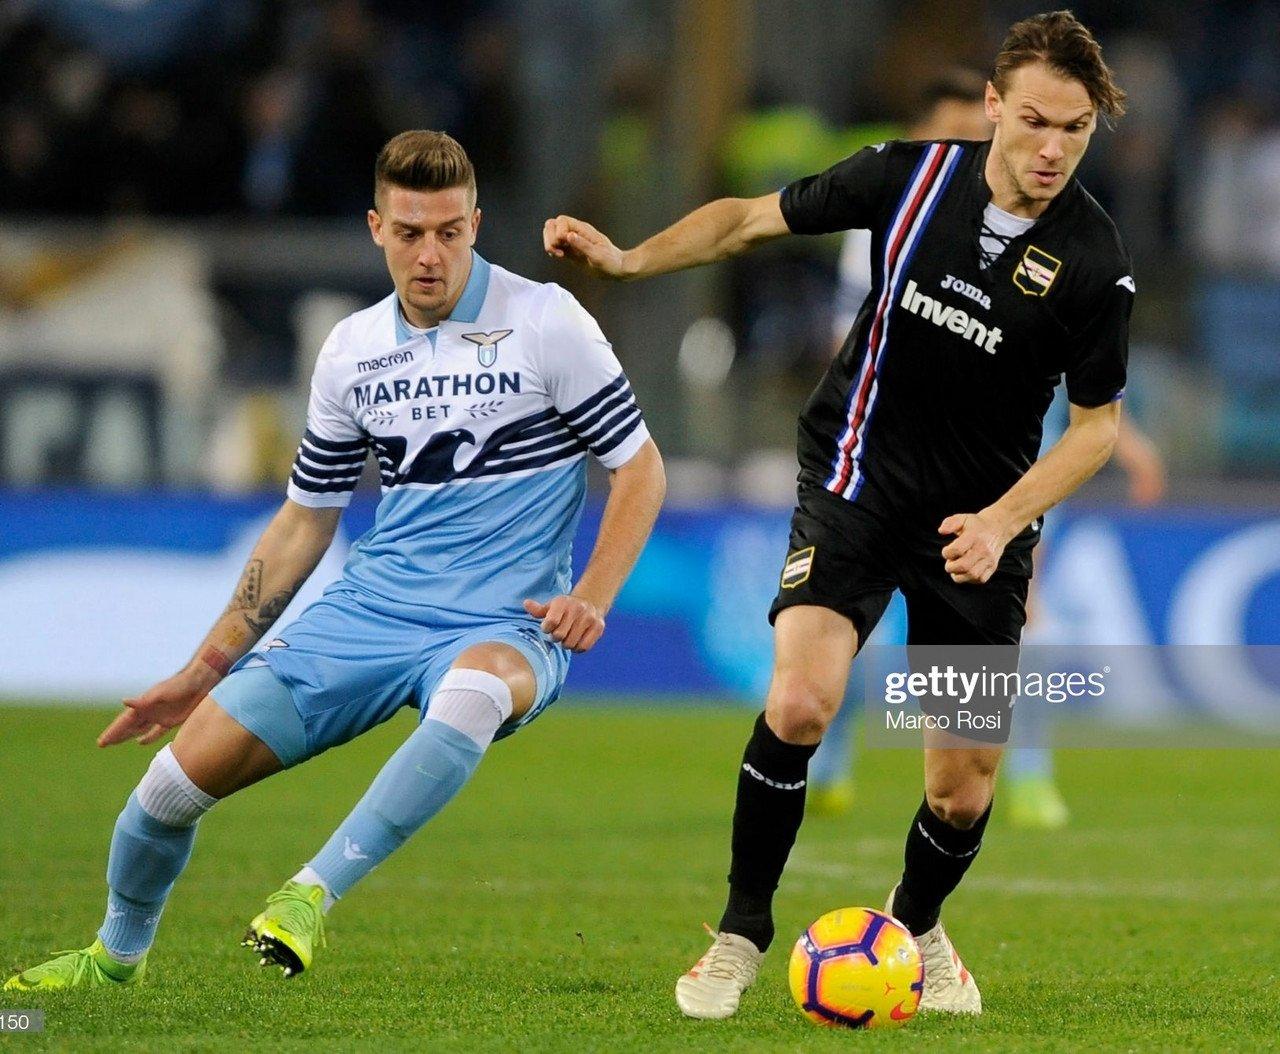 Match Preview: Lazio vs Sampdoria